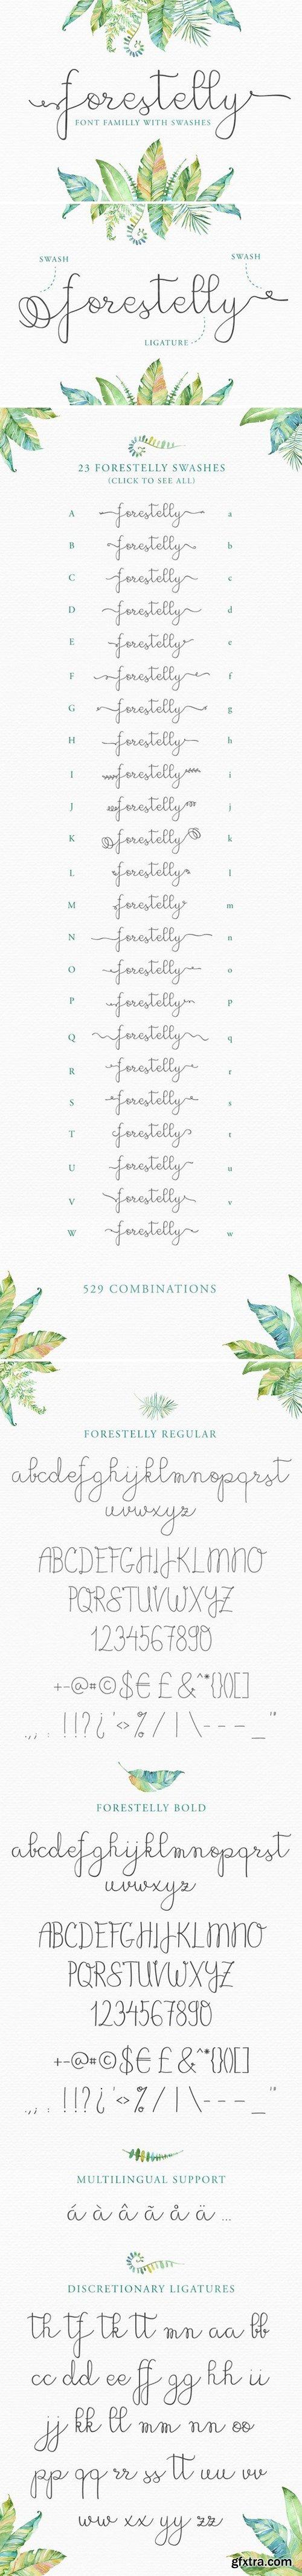 CM - Forestelly wedding + swashes 332281